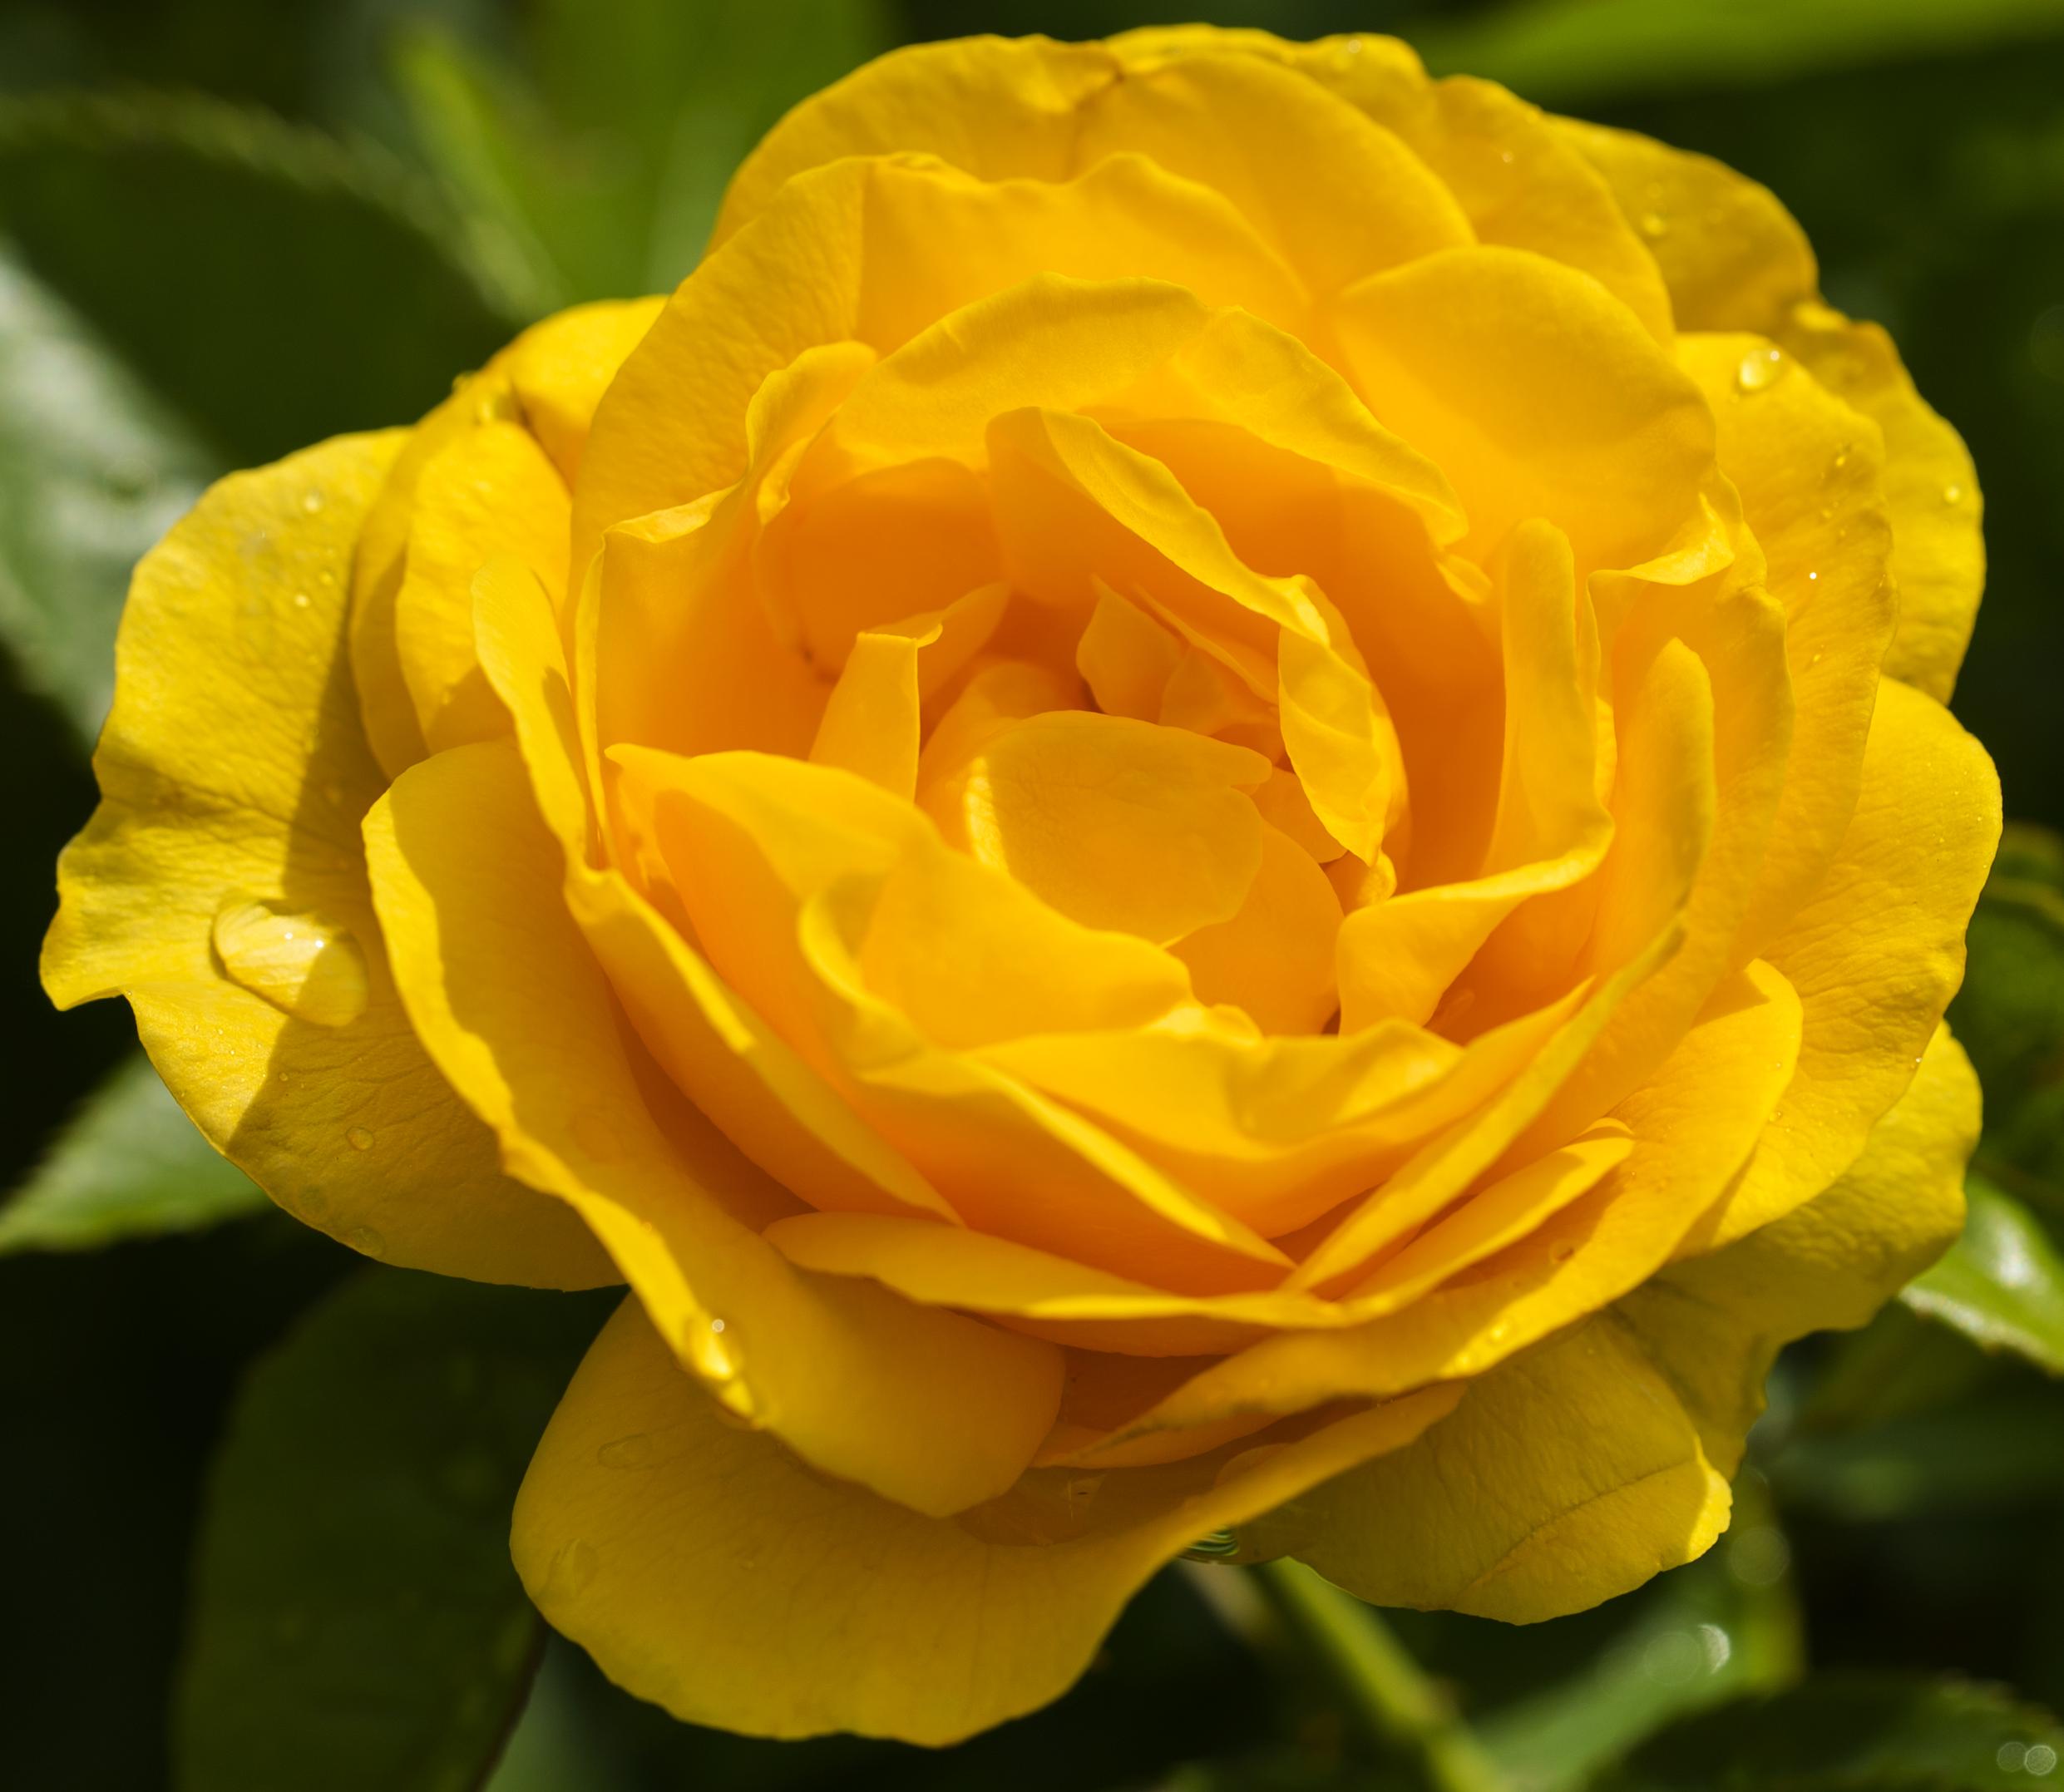 Yello Rose copy